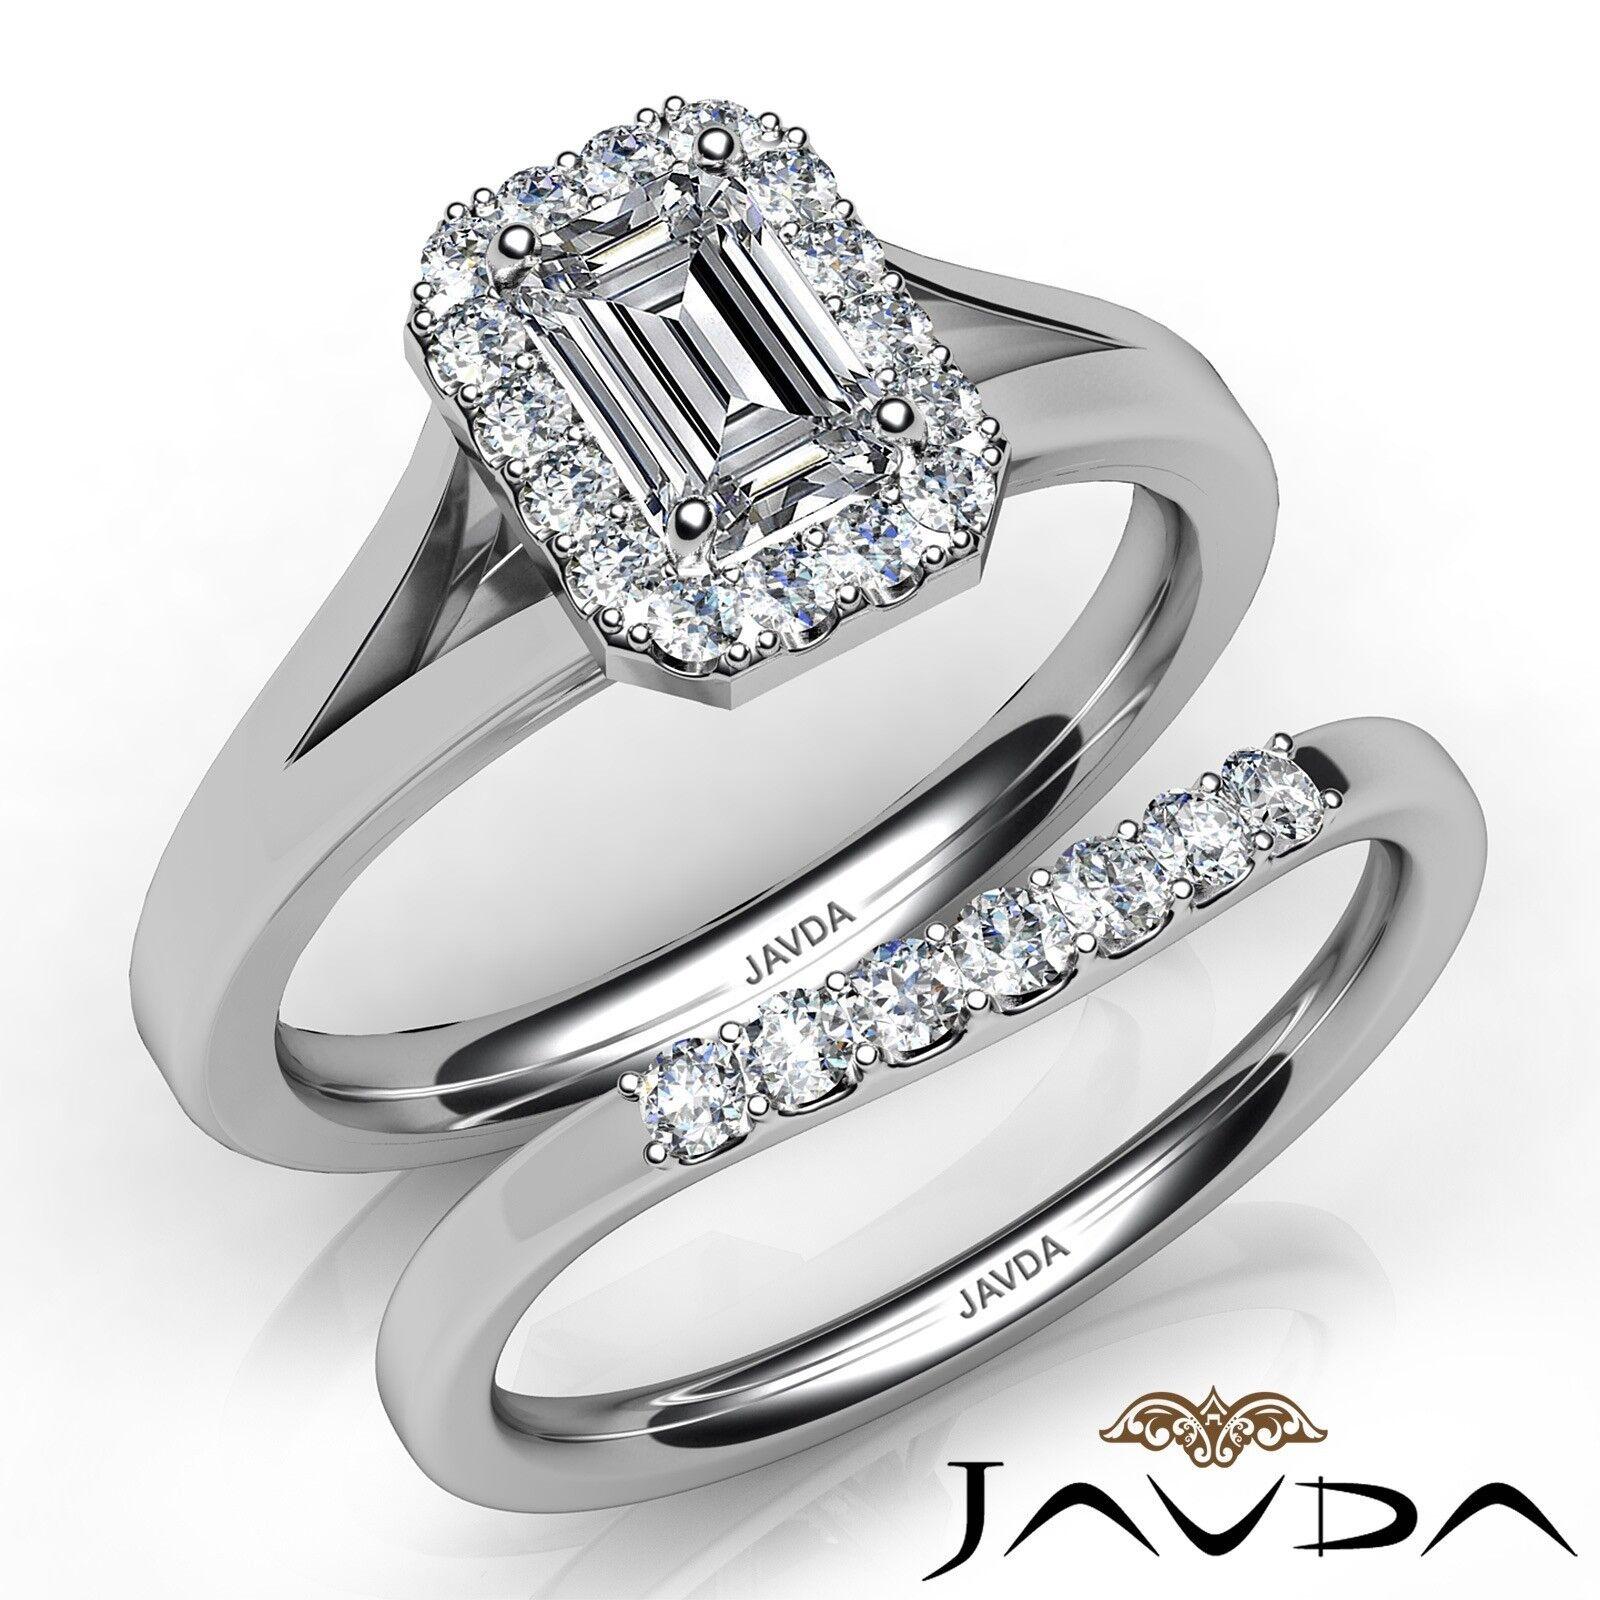 0.86ctw Classic Halo Bridal Set Pave Emerald Diamond Engagement Ring GIA E-VVS1